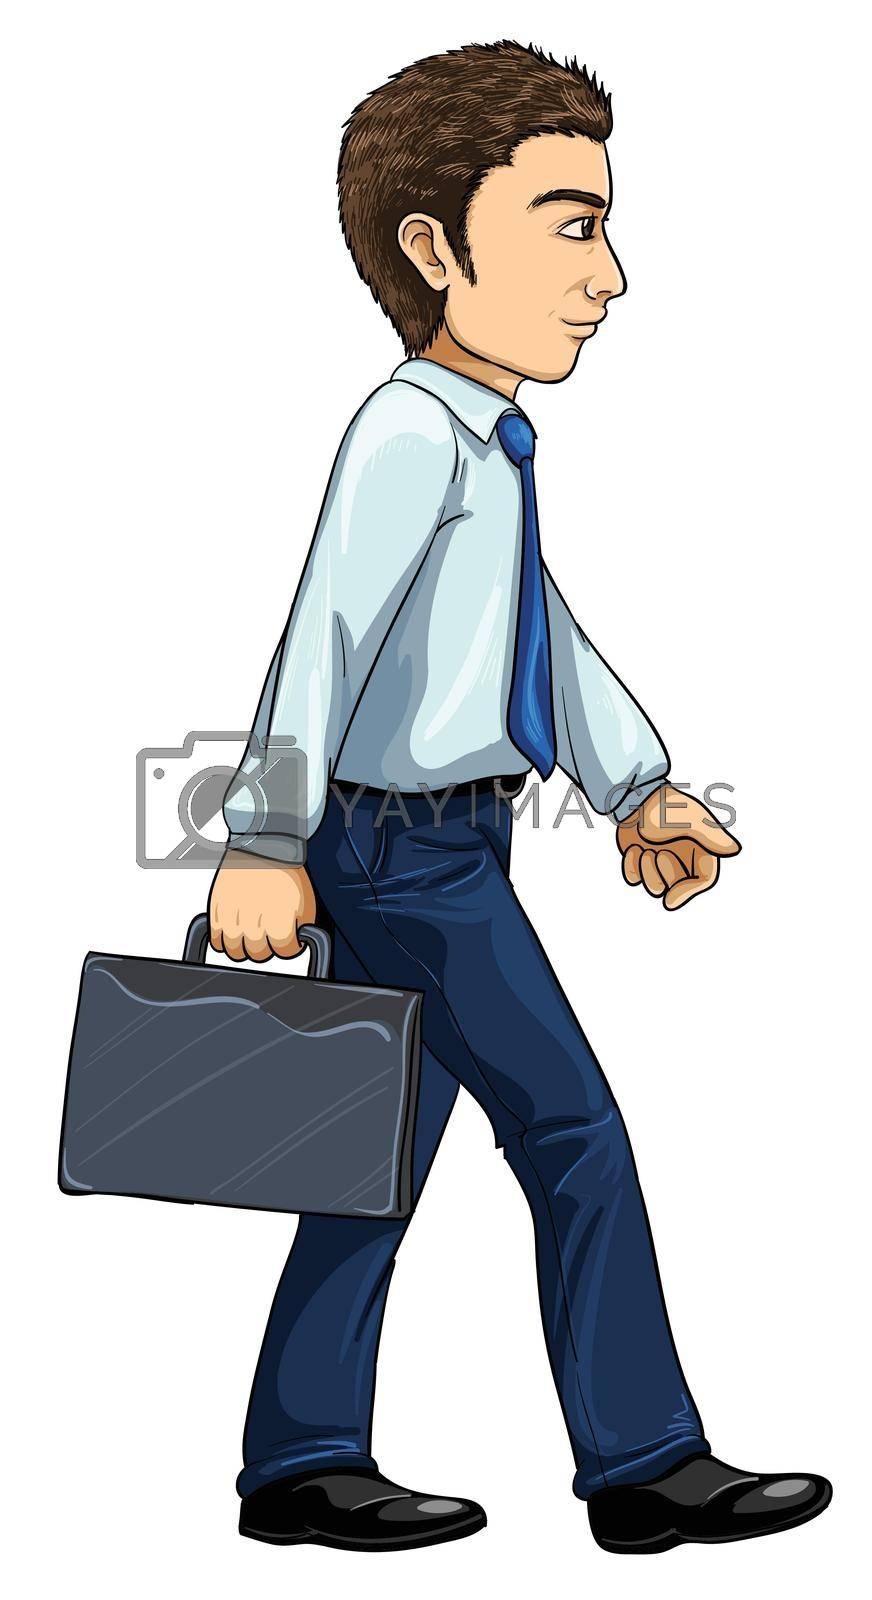 Illustration of modern man from evolution series